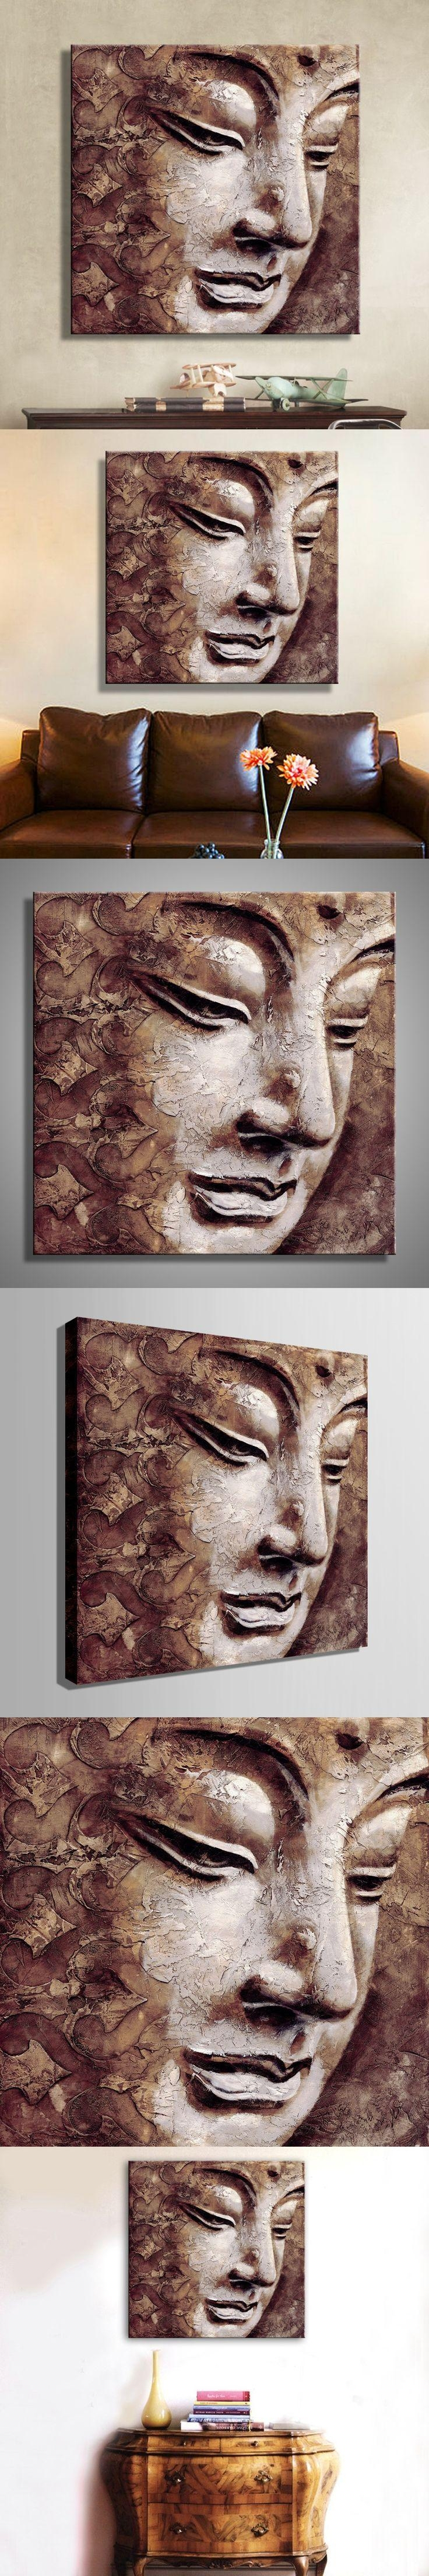 Best 25+ Buddha Wall Art Ideas On Pinterest | Buddha Art, Buddha Regarding Buddha Wood Wall Art (View 16 of 20)